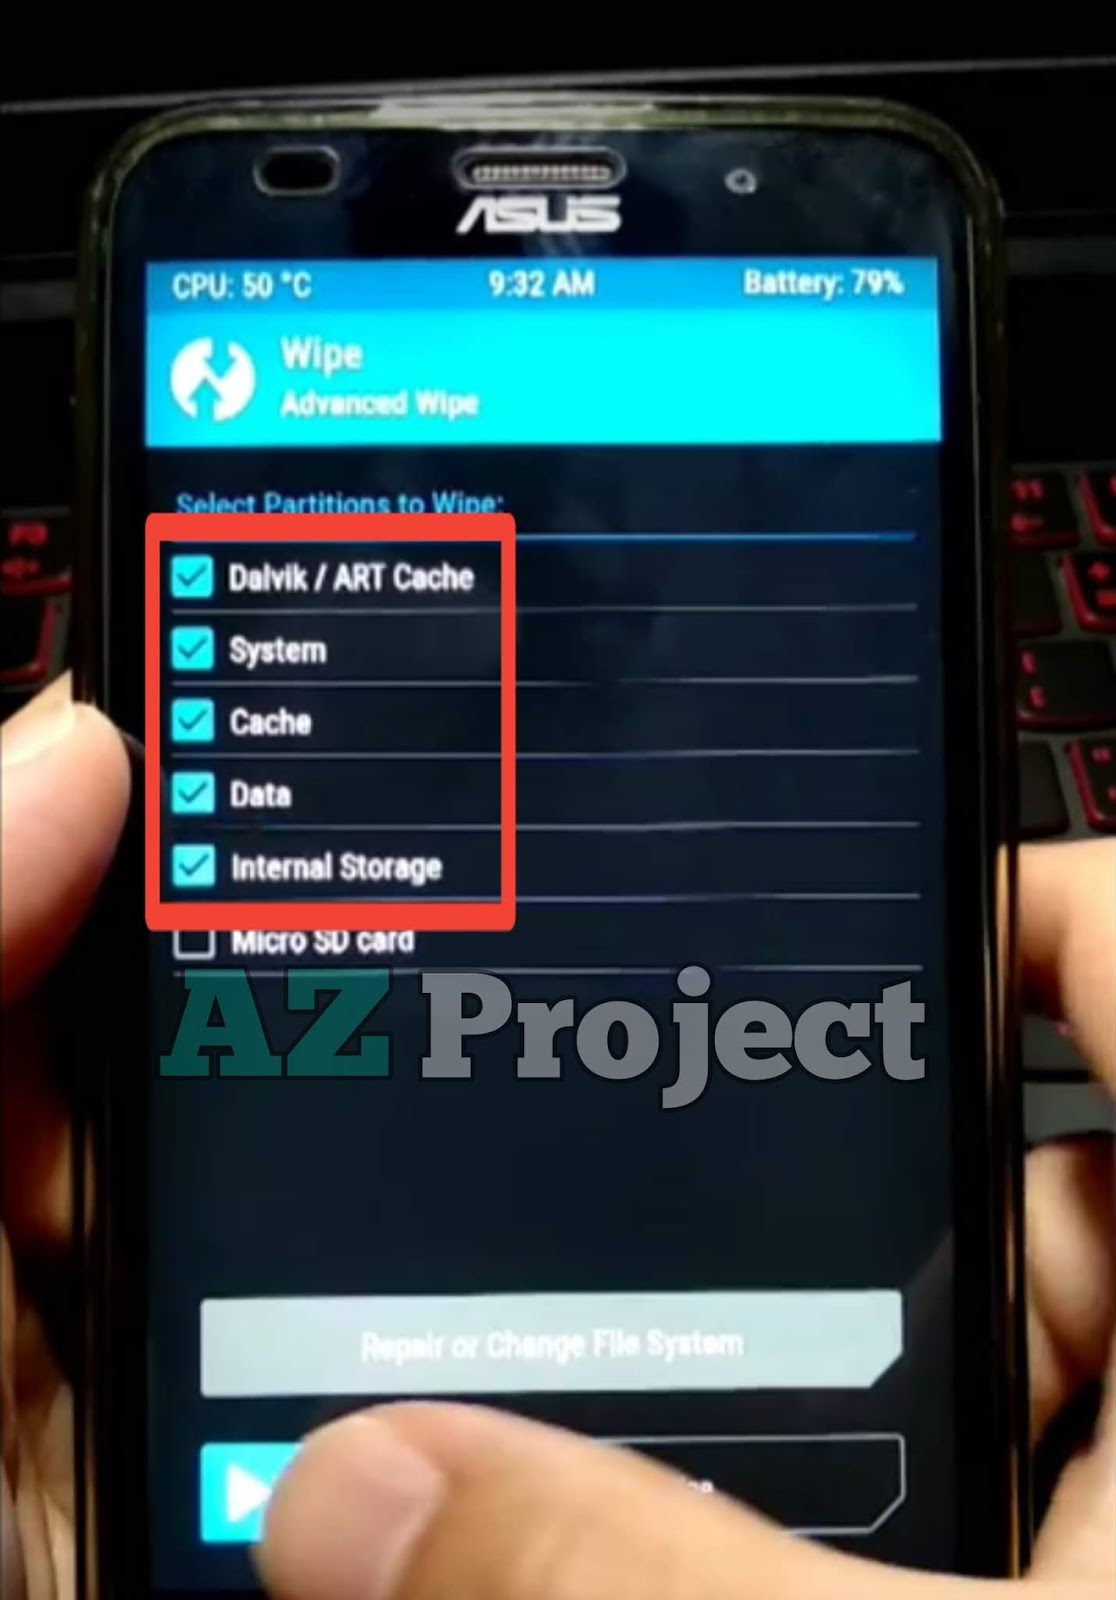 Cara Update Asus Zenfone 2 Ze551ml Ke Marshmallow : update, zenfone, ze551ml, marshmallow, Flash, Android, Zenfone, [ZE551ML/ZE550ML], Oprek